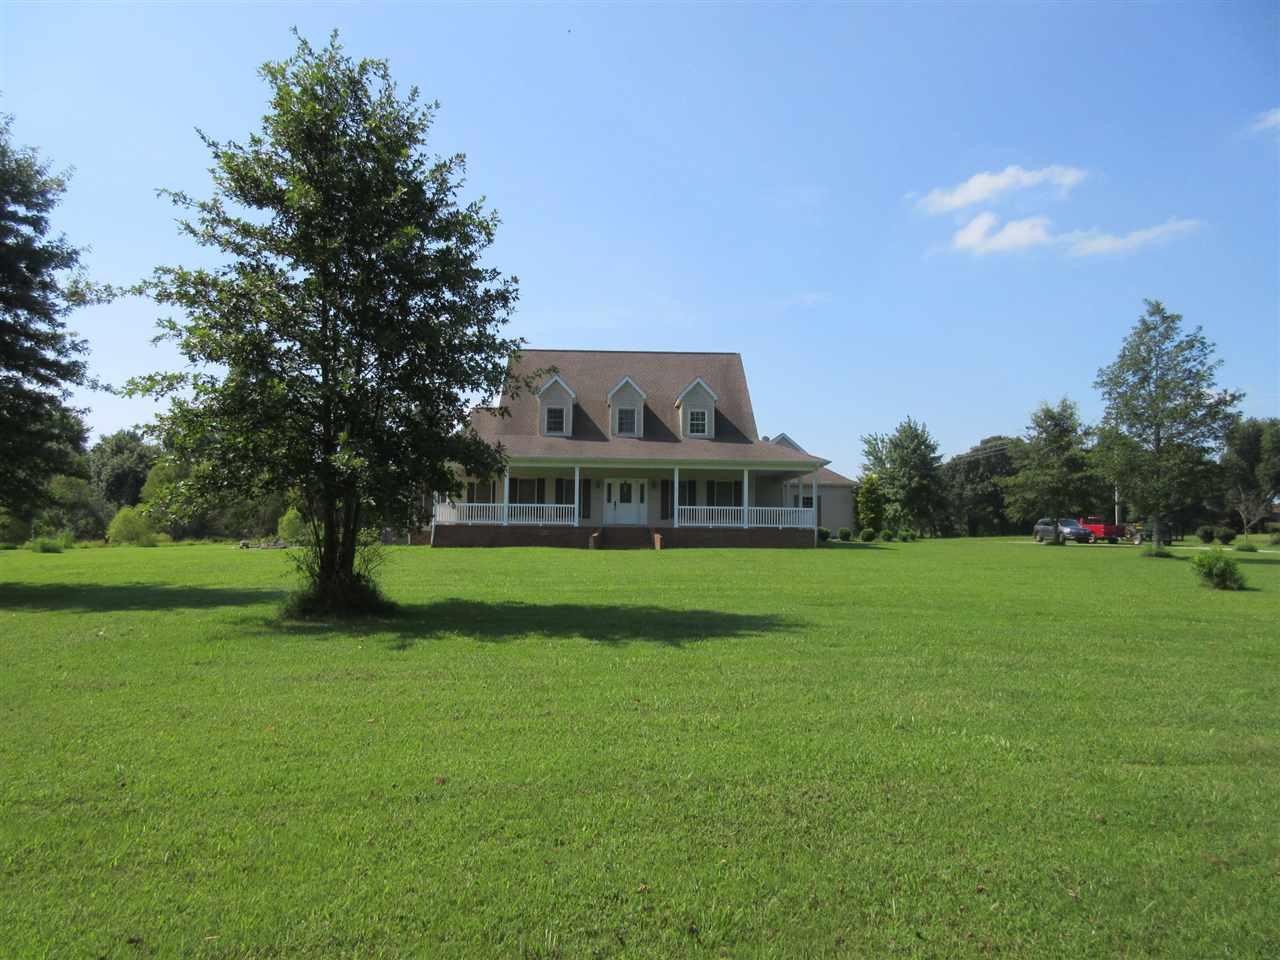 Real Estate for Sale, ListingId: 35346150, Mayfield,KY42066